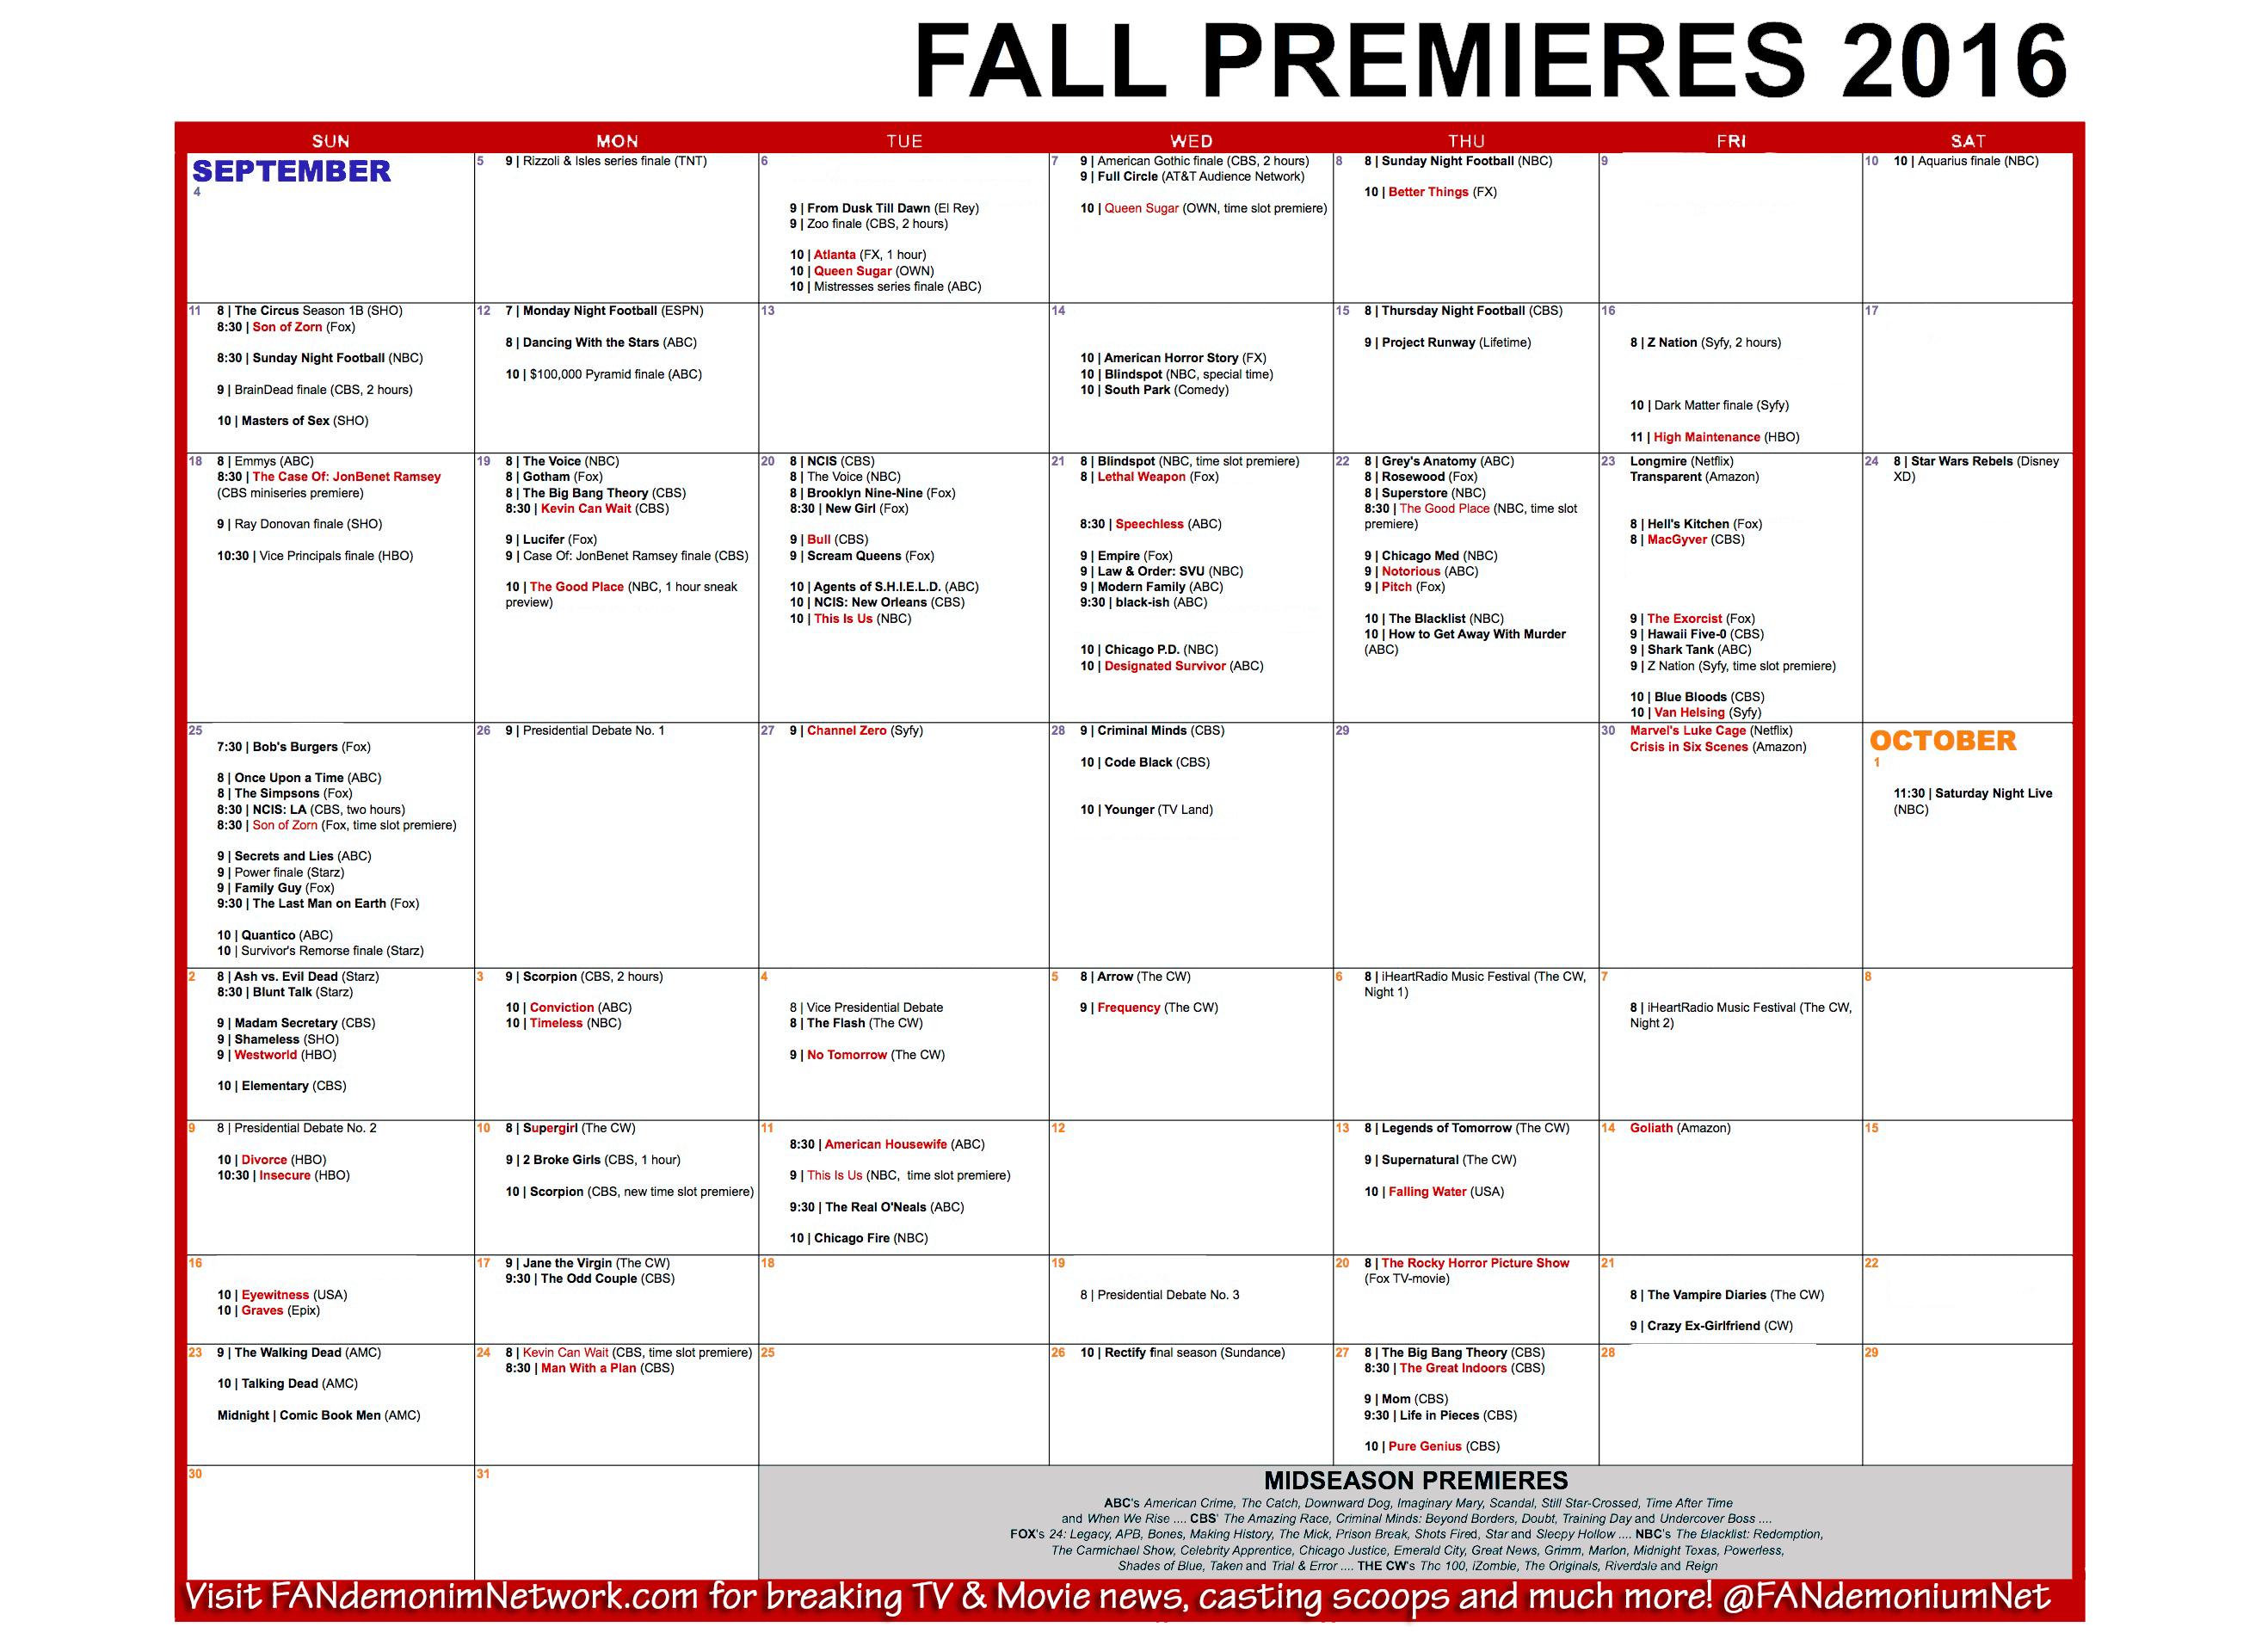 tv schedule fall premieres 2016 - fandemonium network